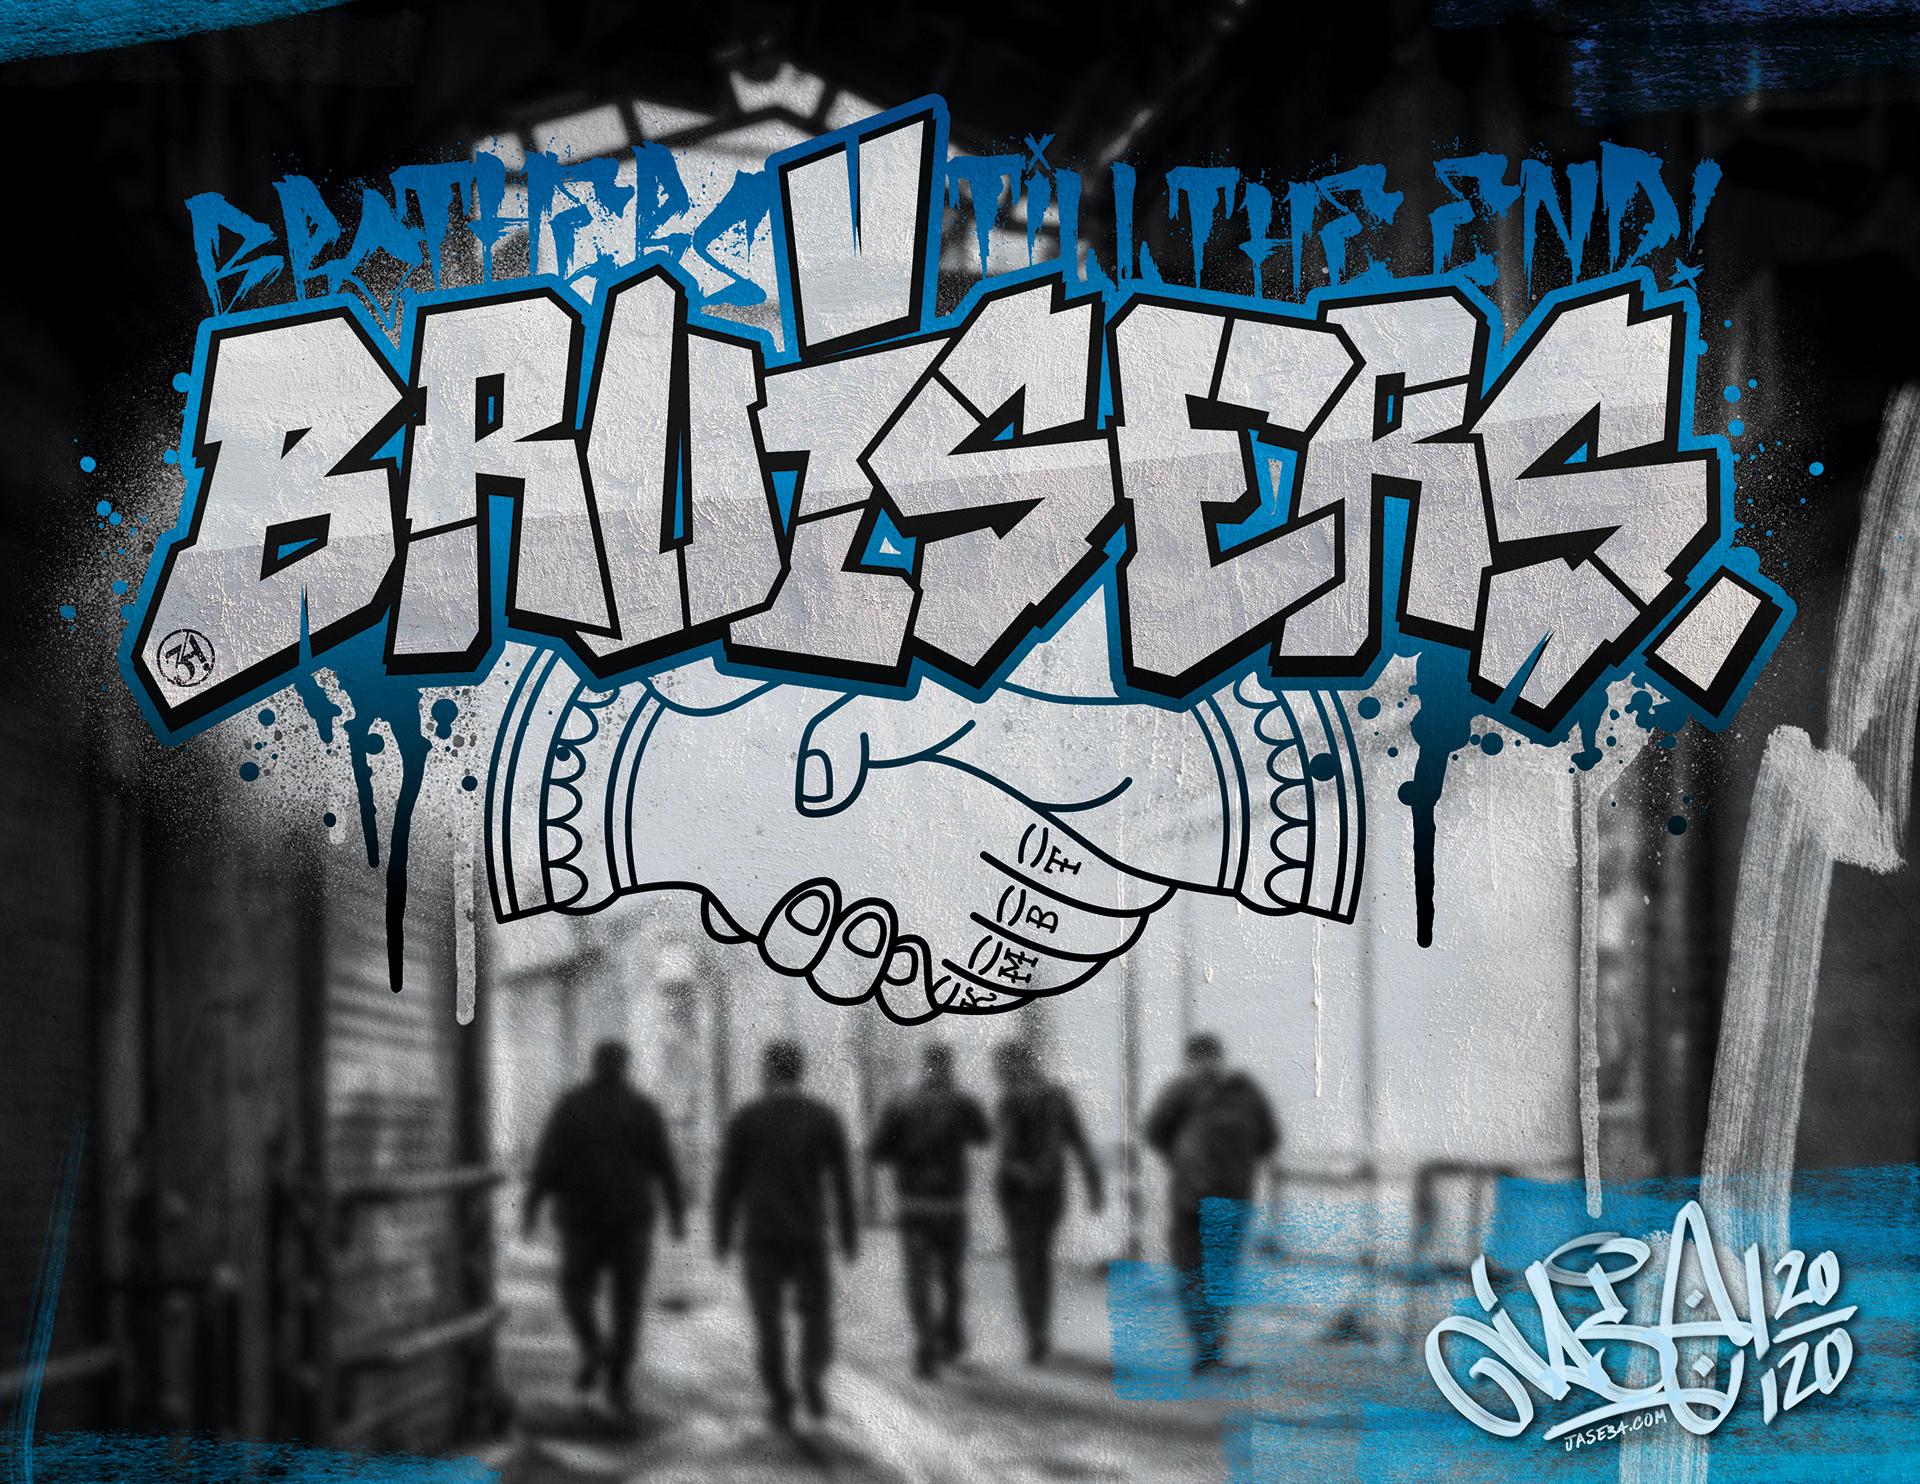 Jase34 x Urban Styles / The Oi Blackbook 2021 / THE BRUISERS